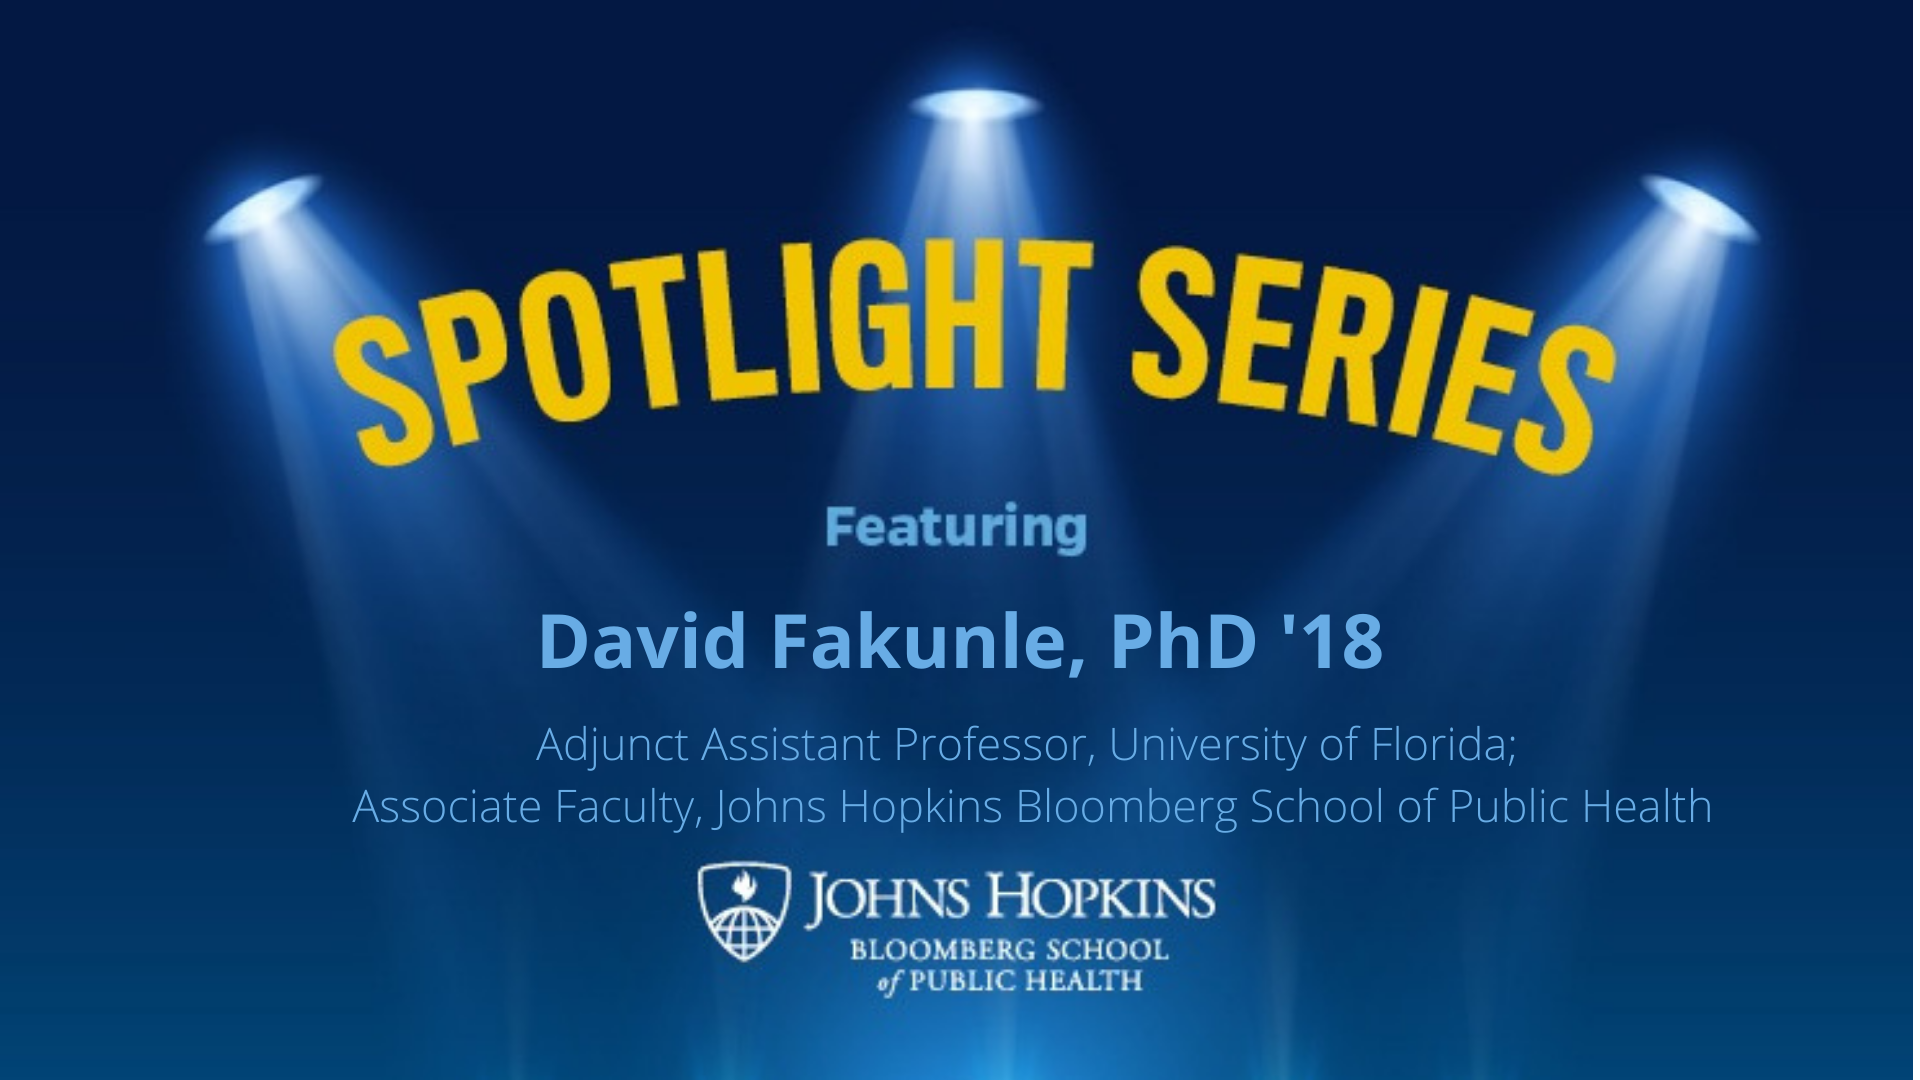 spotlight series logo, blue background yellow text